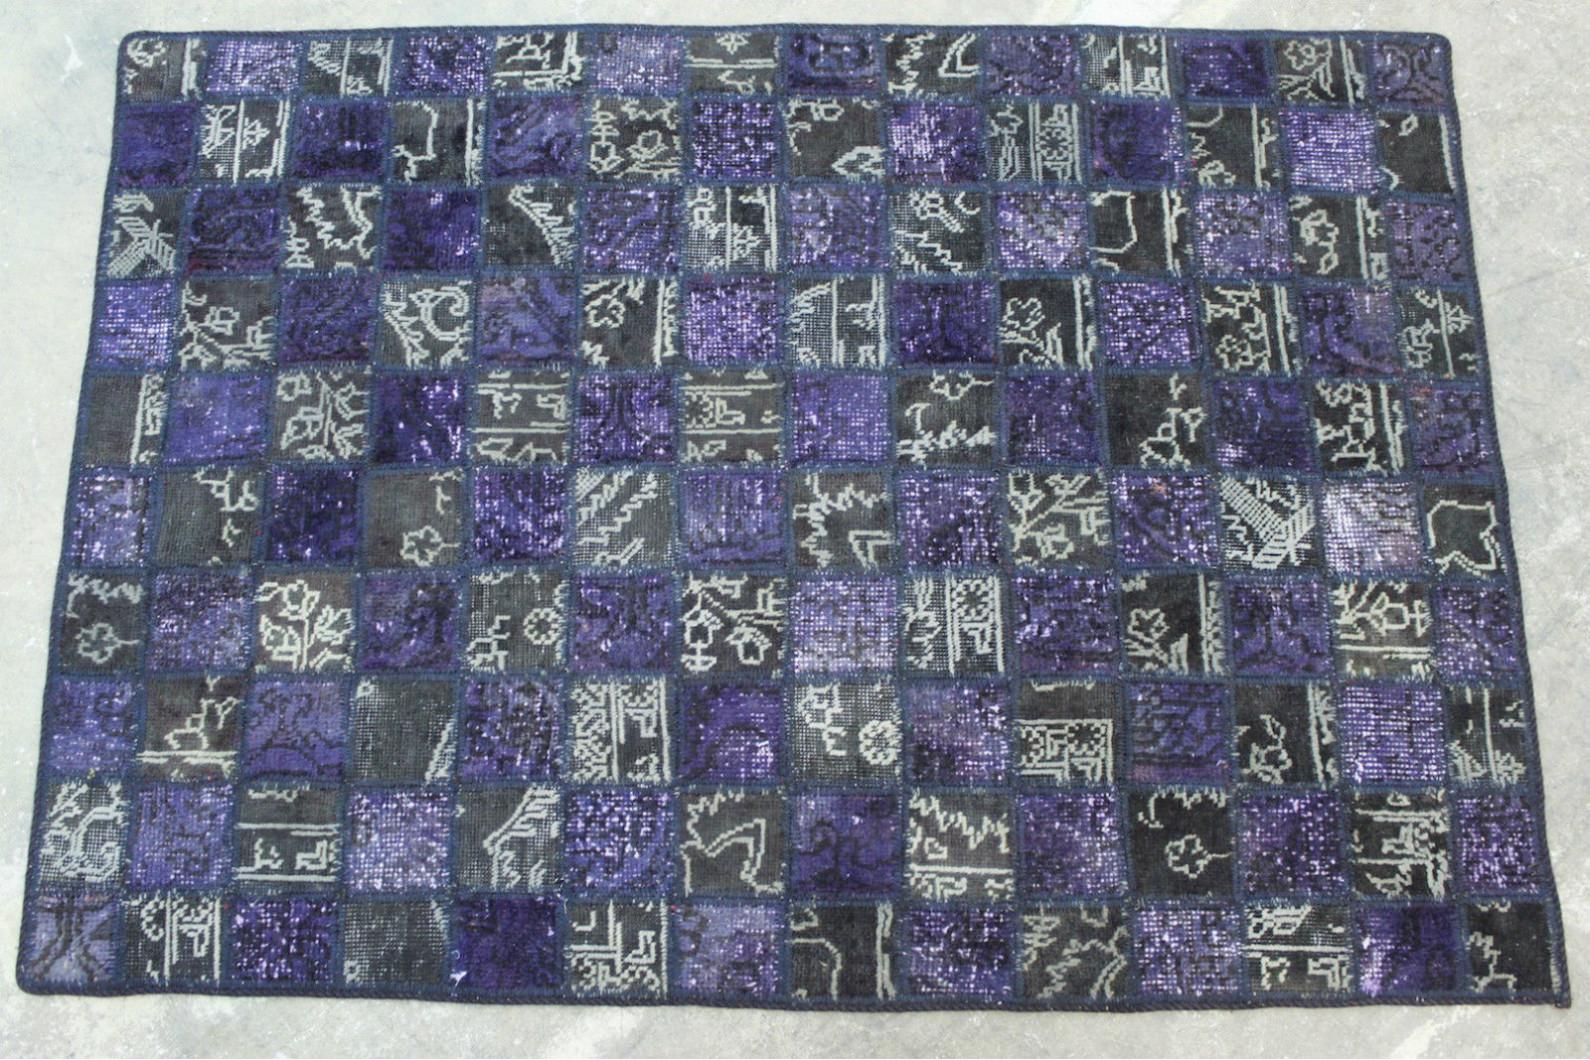 Patchwork Teppich Lila Grau In Xcm With Teppich Lila Grau